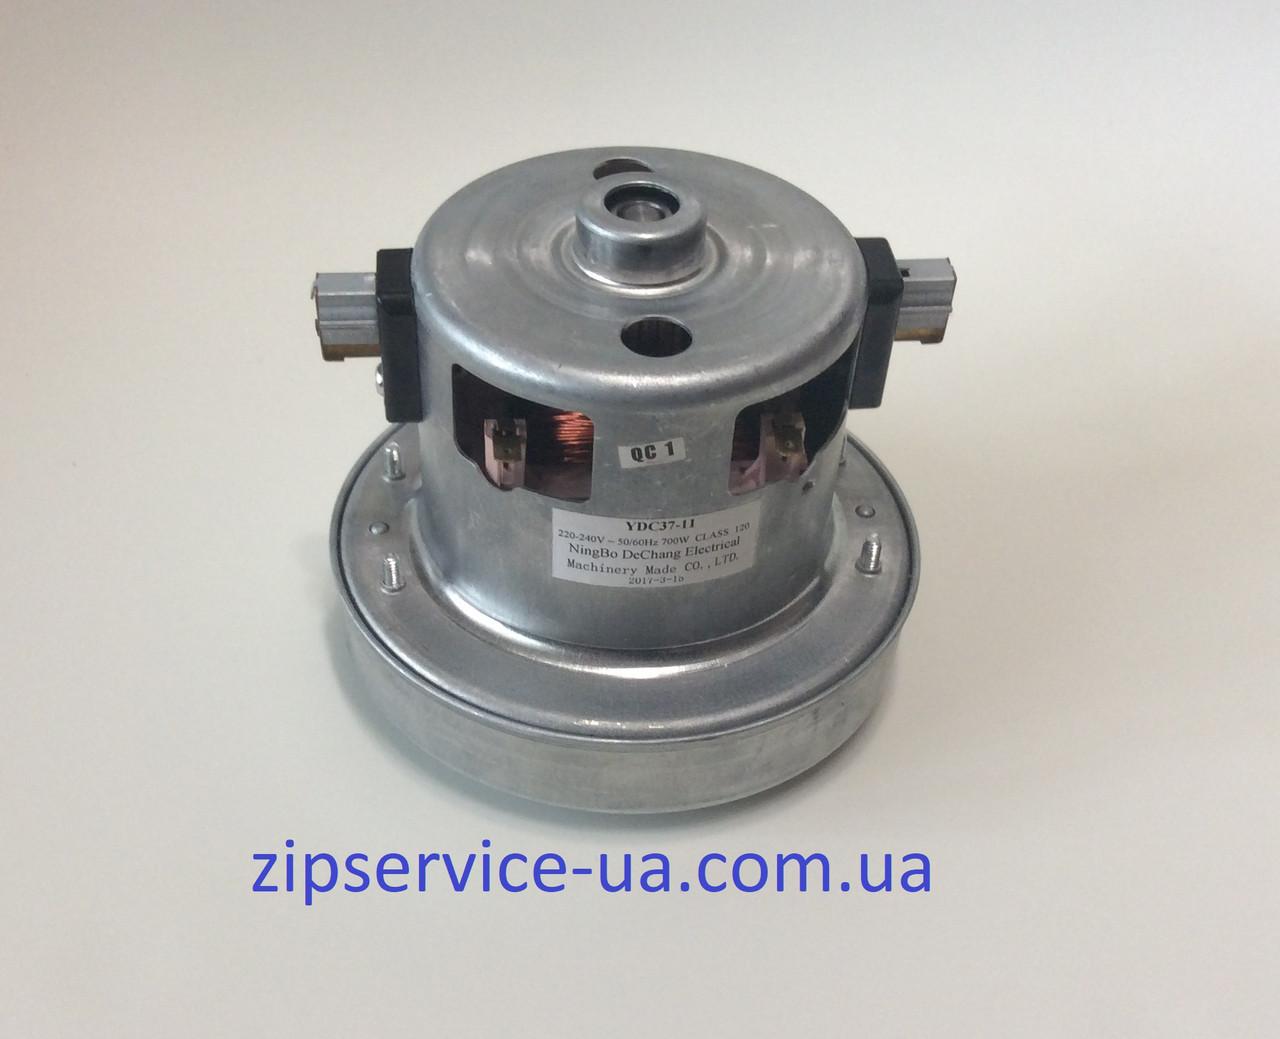 Мотор пылесоса YDC37-11, 700W Class120